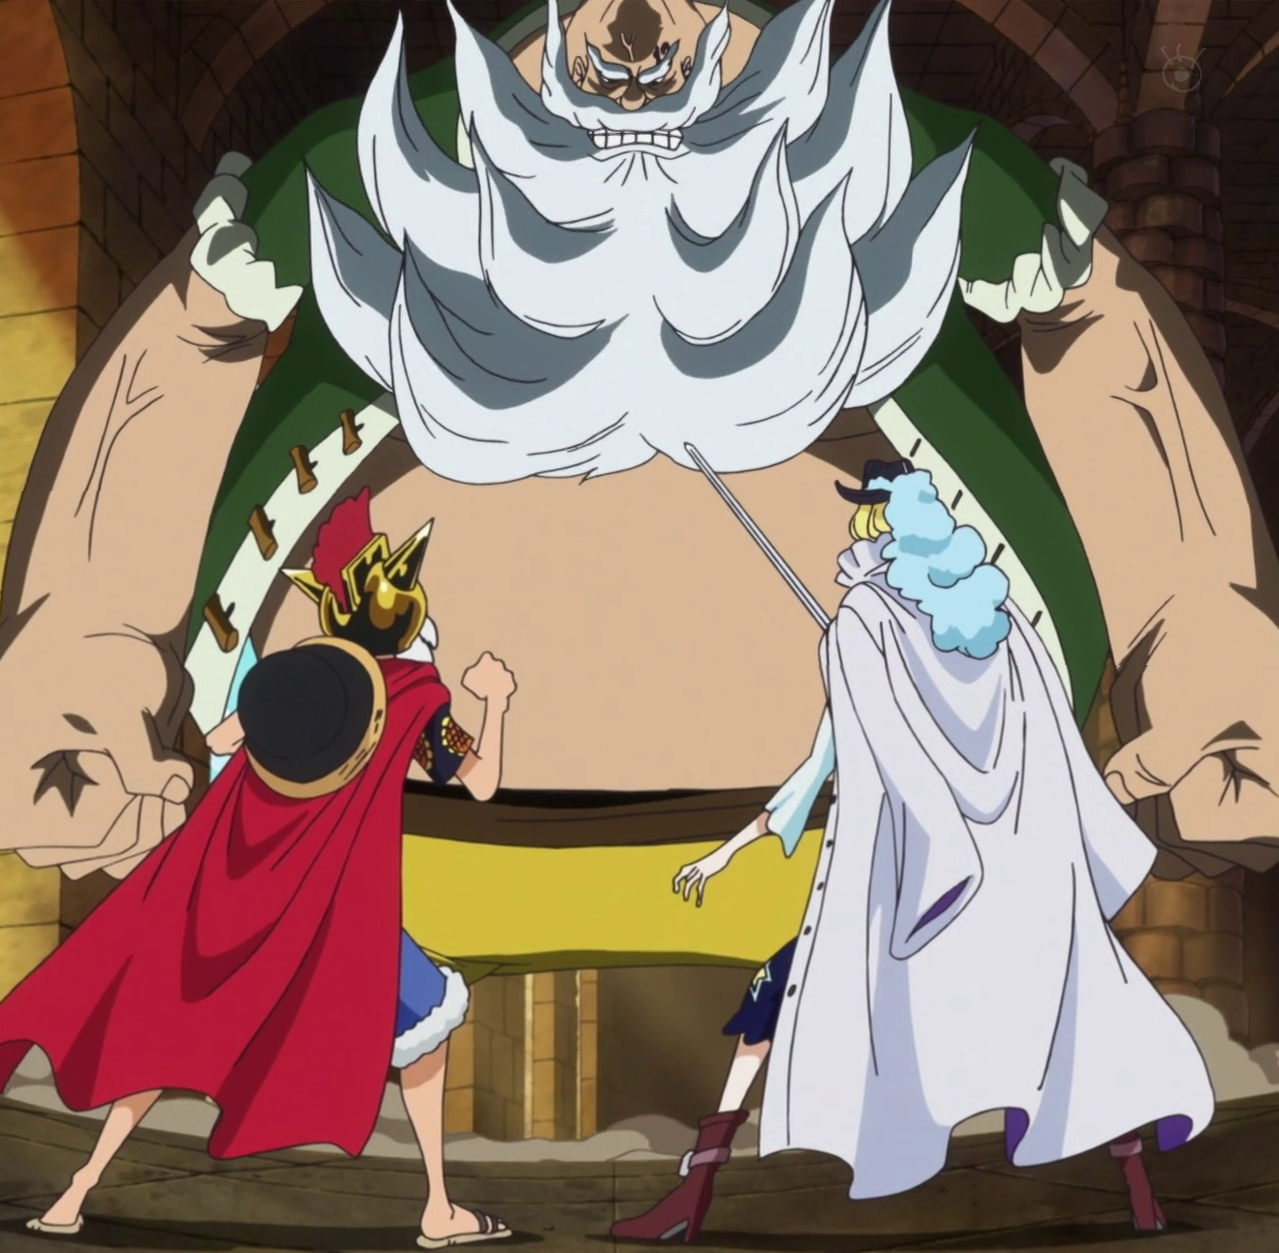 Chinjao vs. Cavendish vs. Monkey D. Luffy